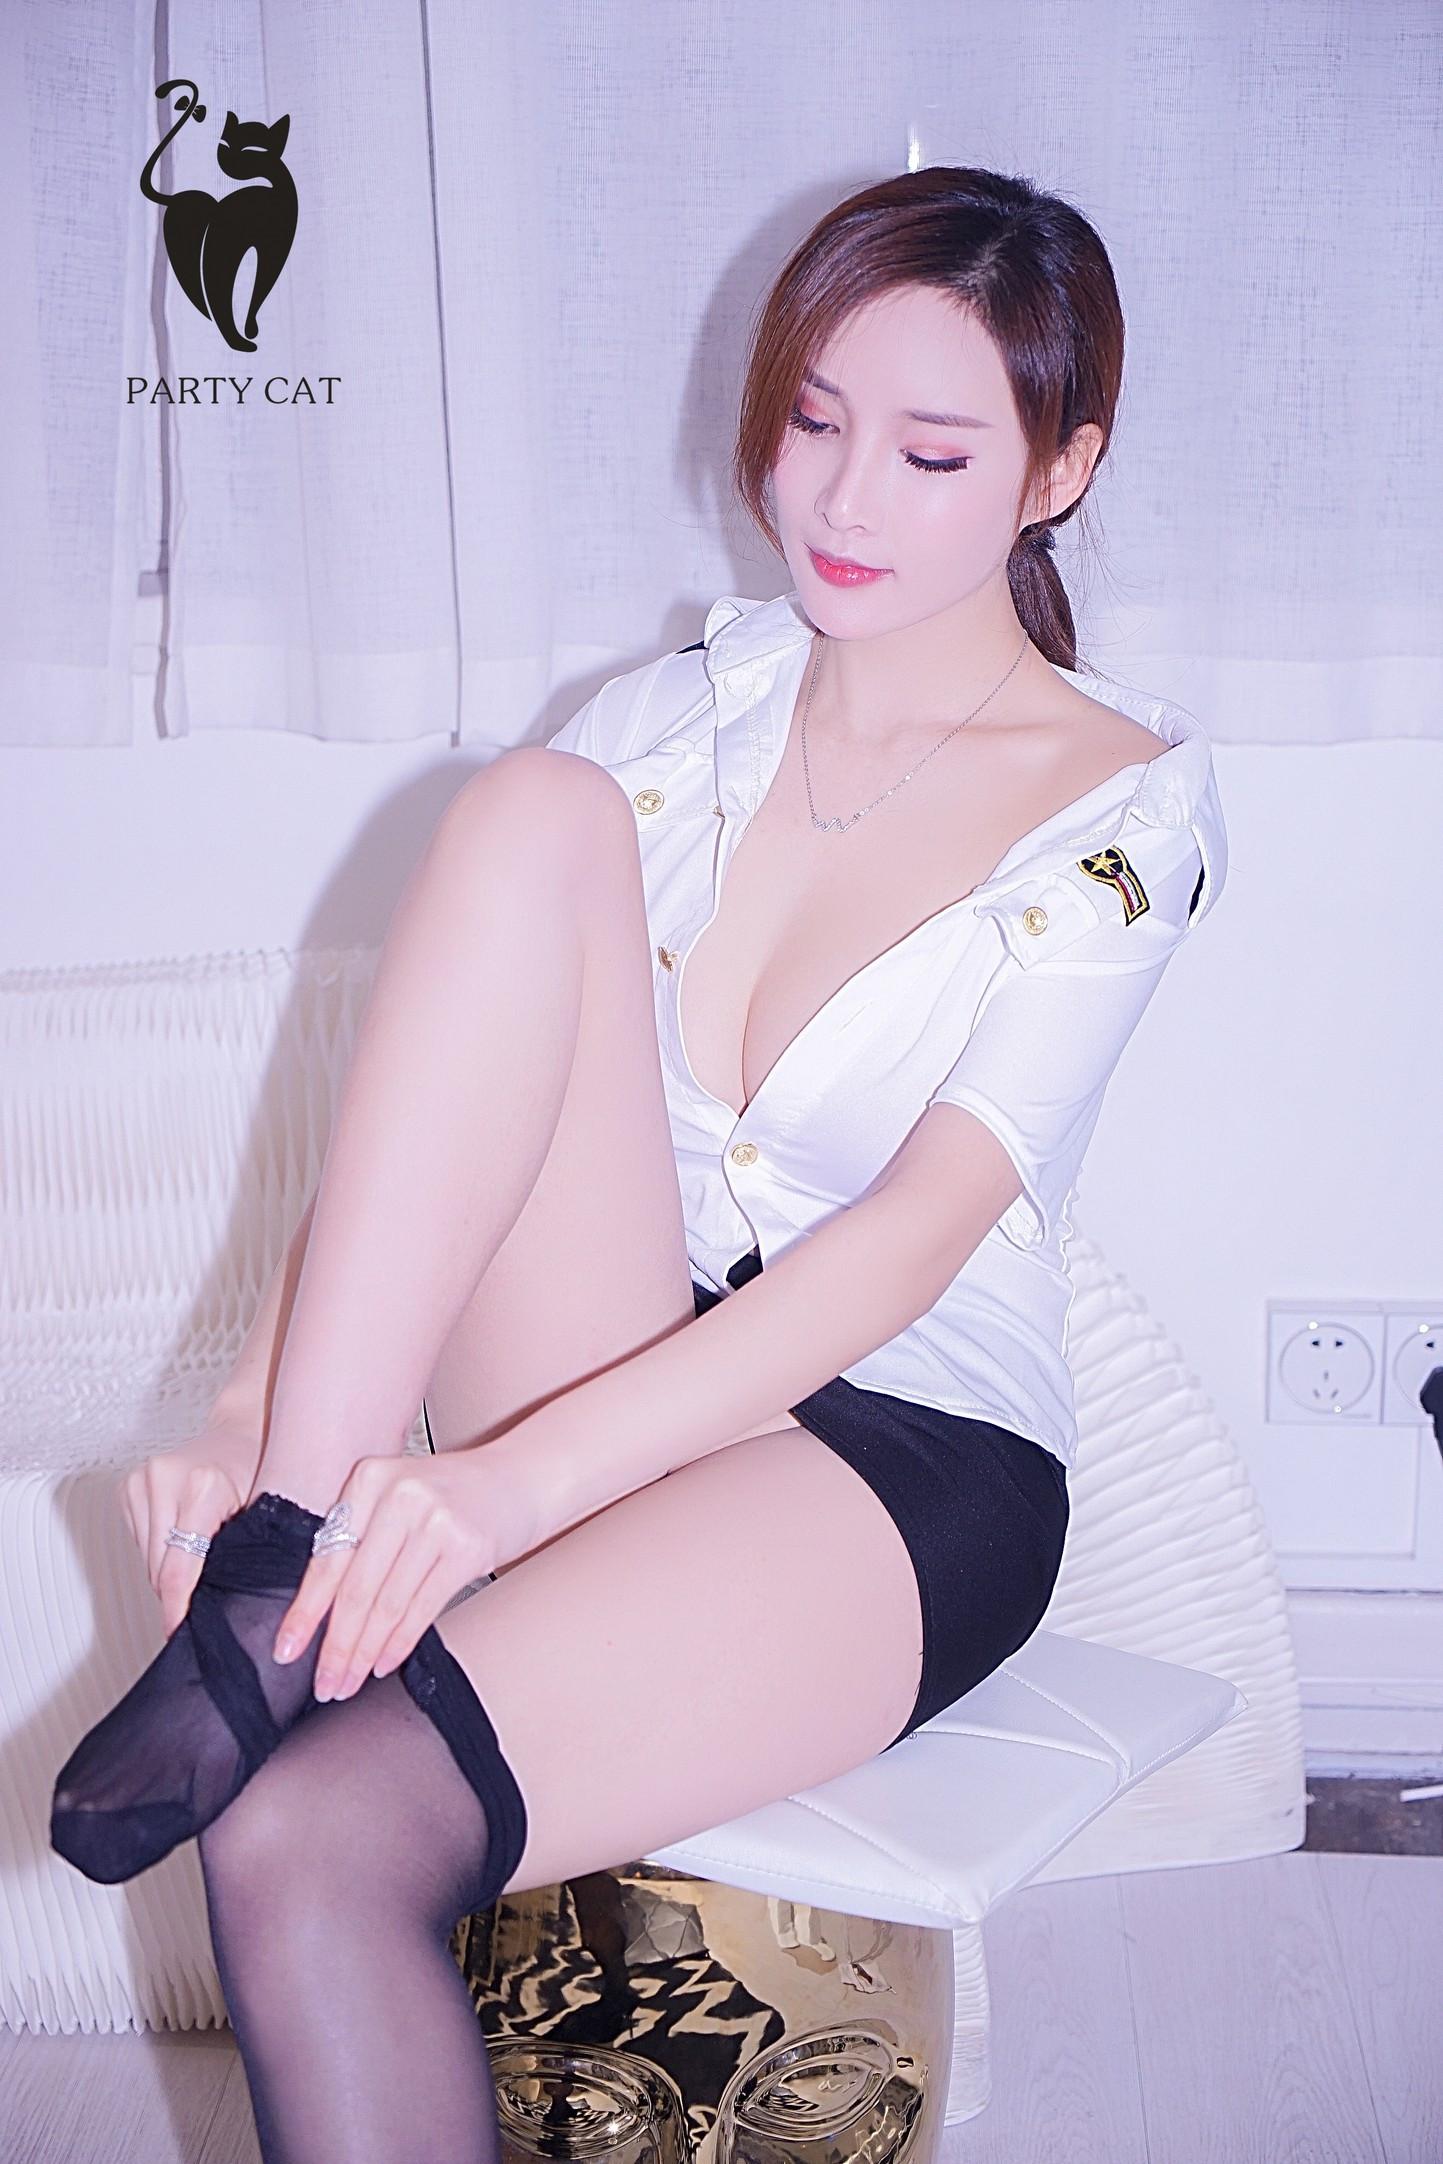 partycat021